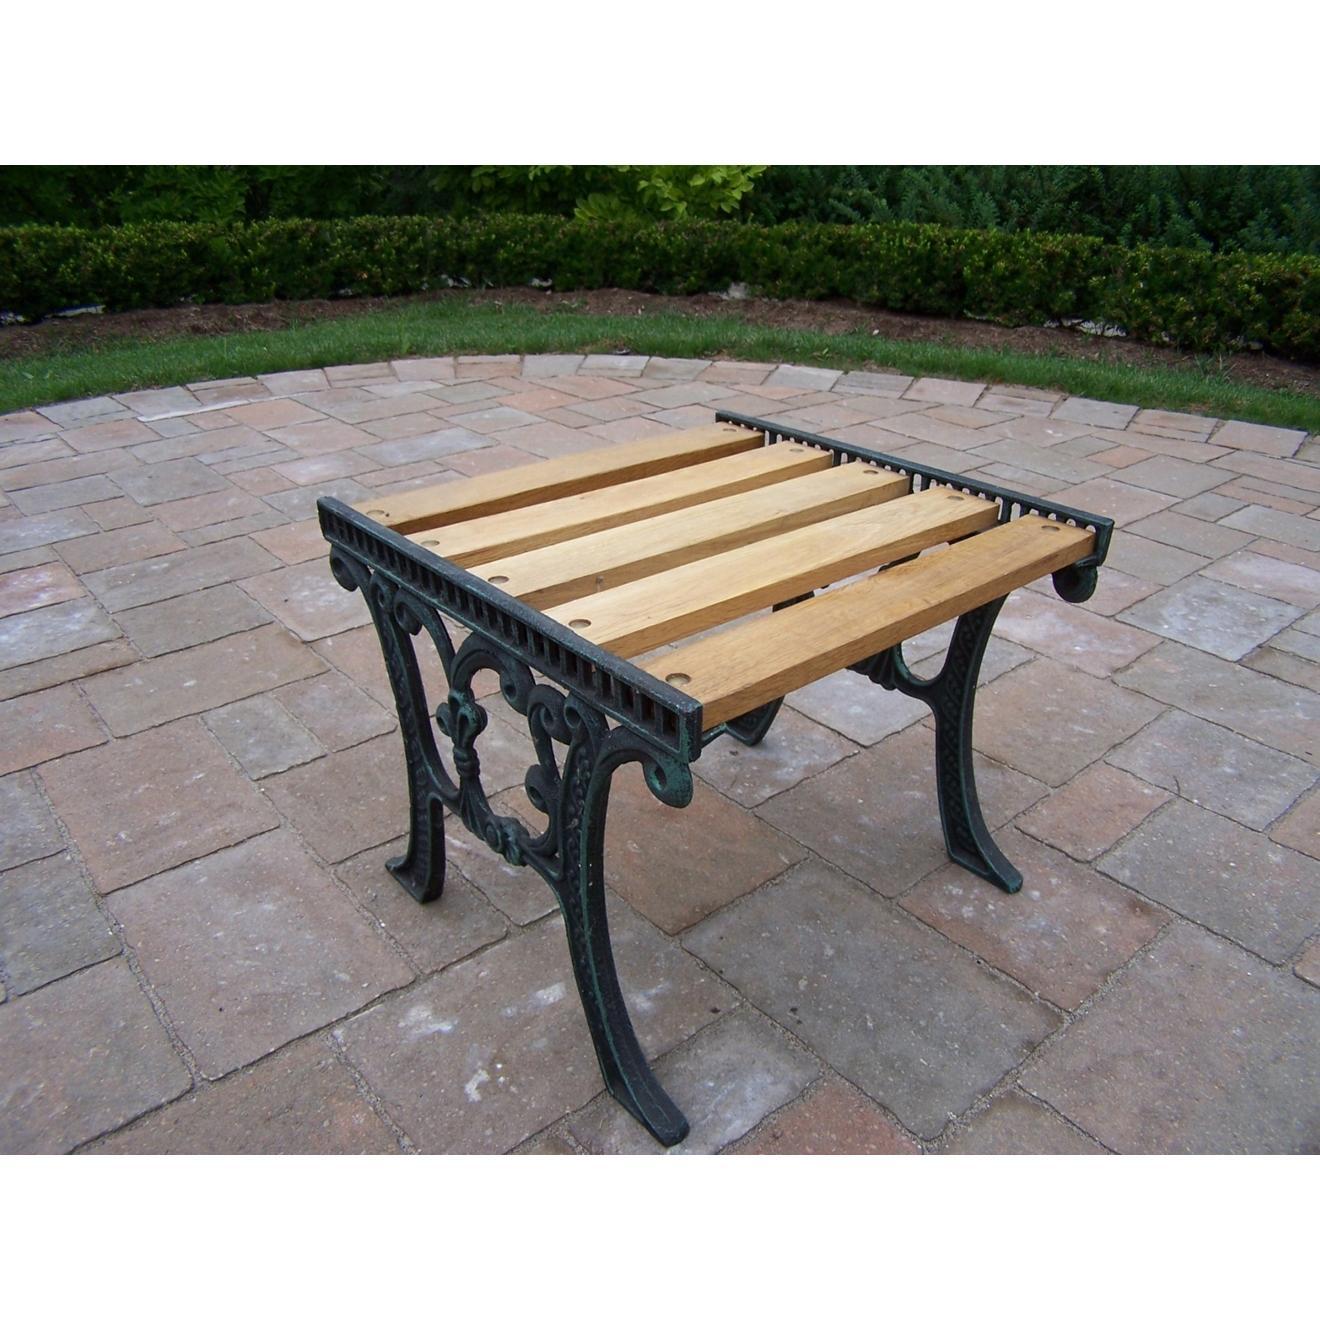 Oakland Living Wooden End Table - Verdi Green